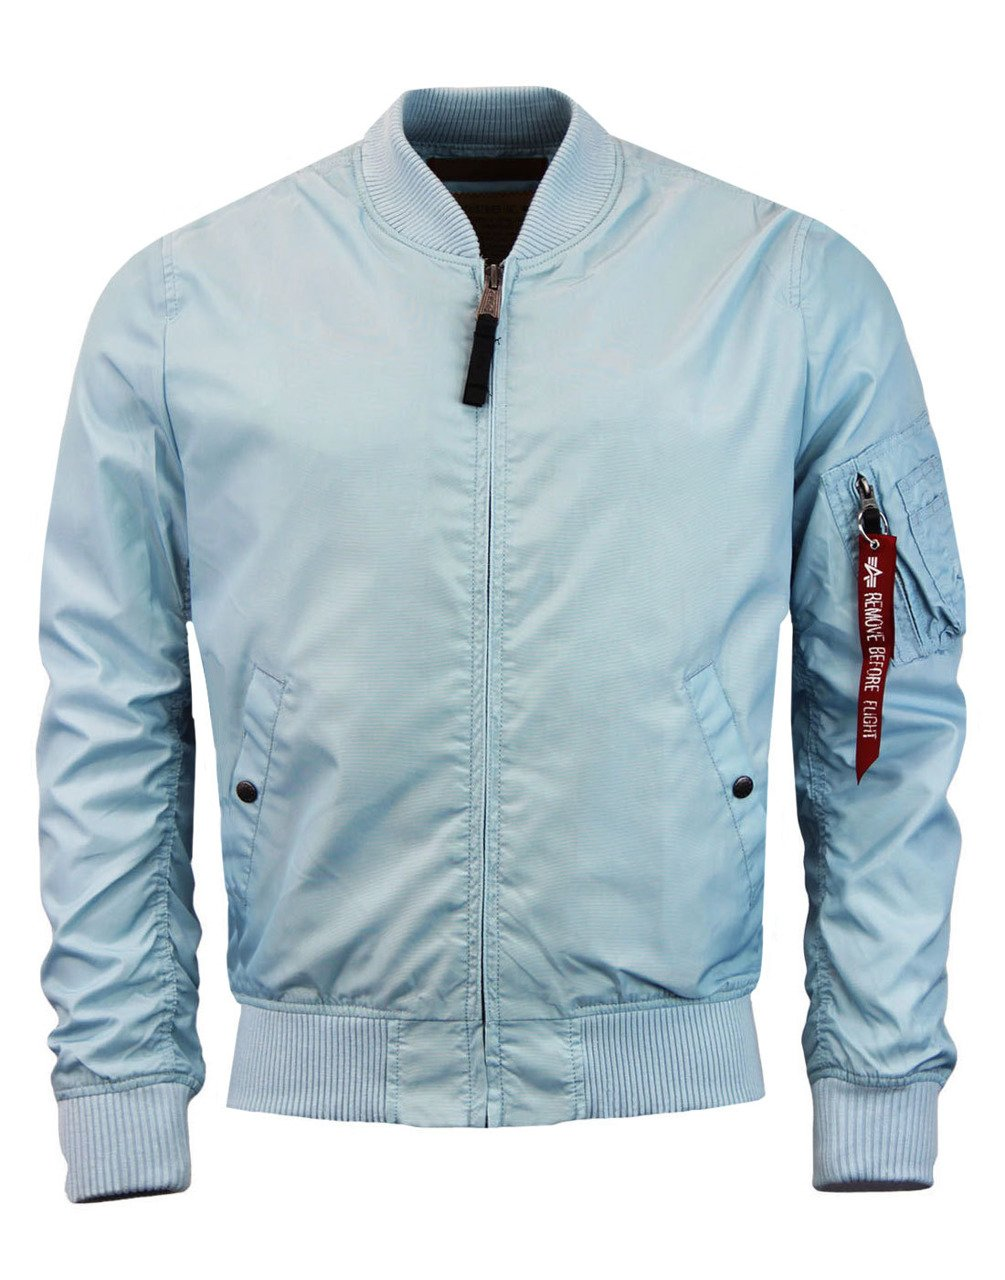 bomber flight jacket ma 1 tt alpha industries blue. Black Bedroom Furniture Sets. Home Design Ideas